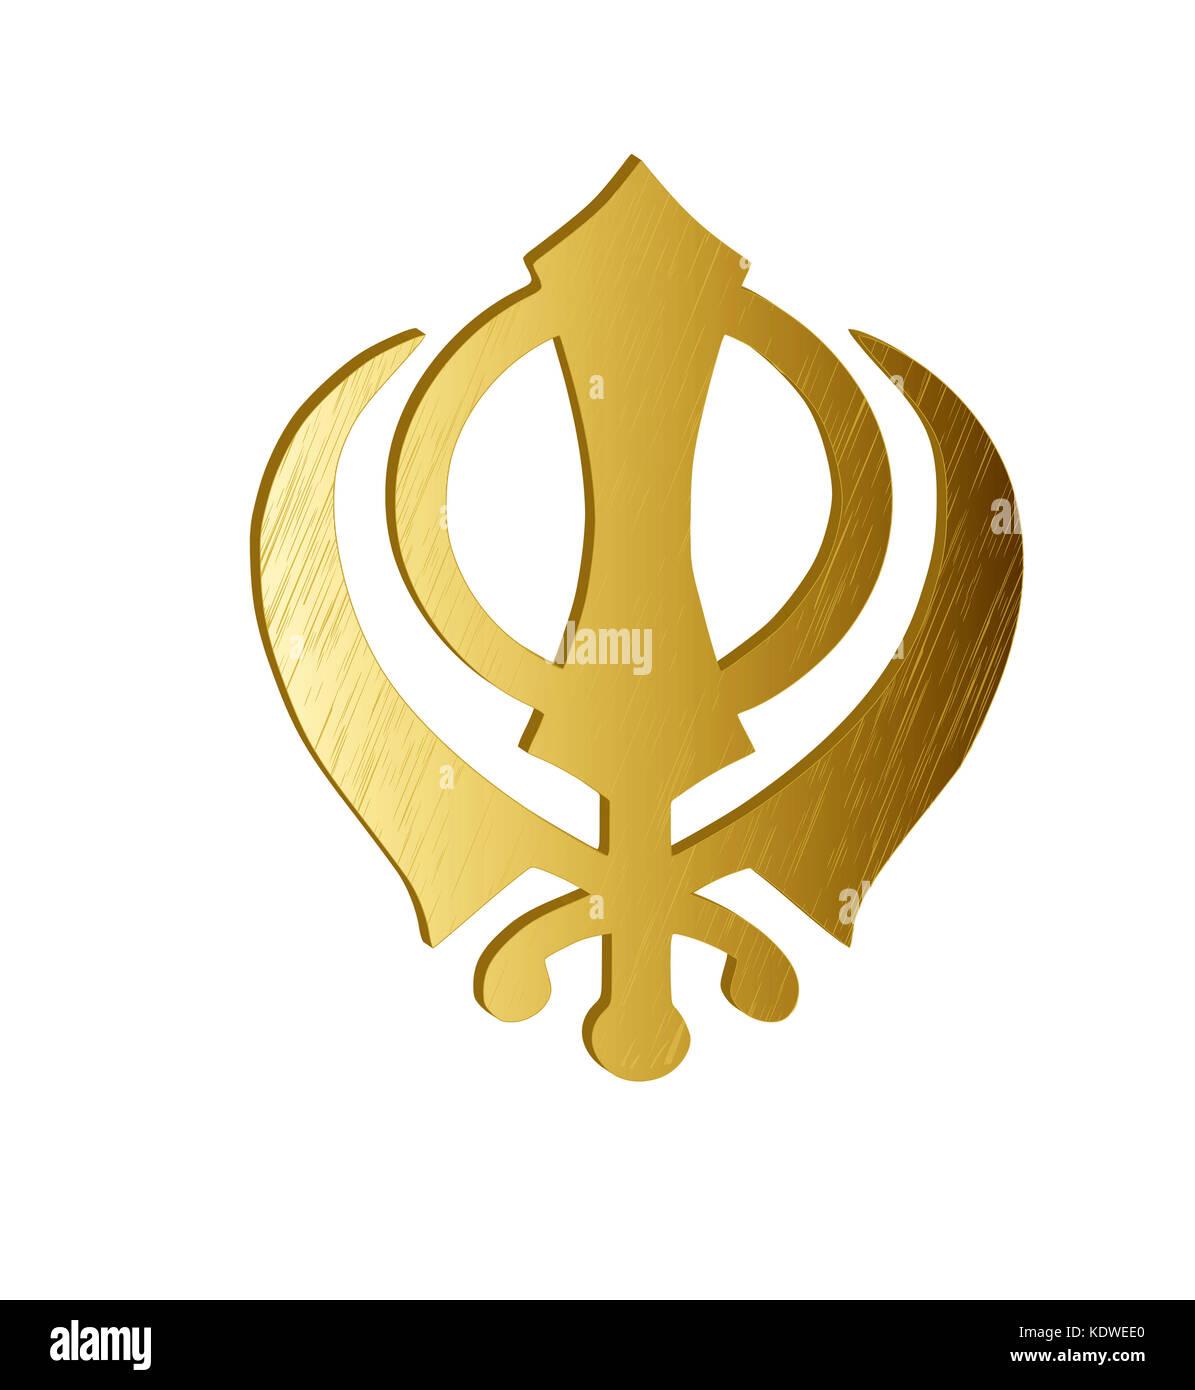 The main symbol of sikhism sign khanda made of gold metal white the main symbol of sikhism sign khanda made of gold metal white background isolated illustration biocorpaavc